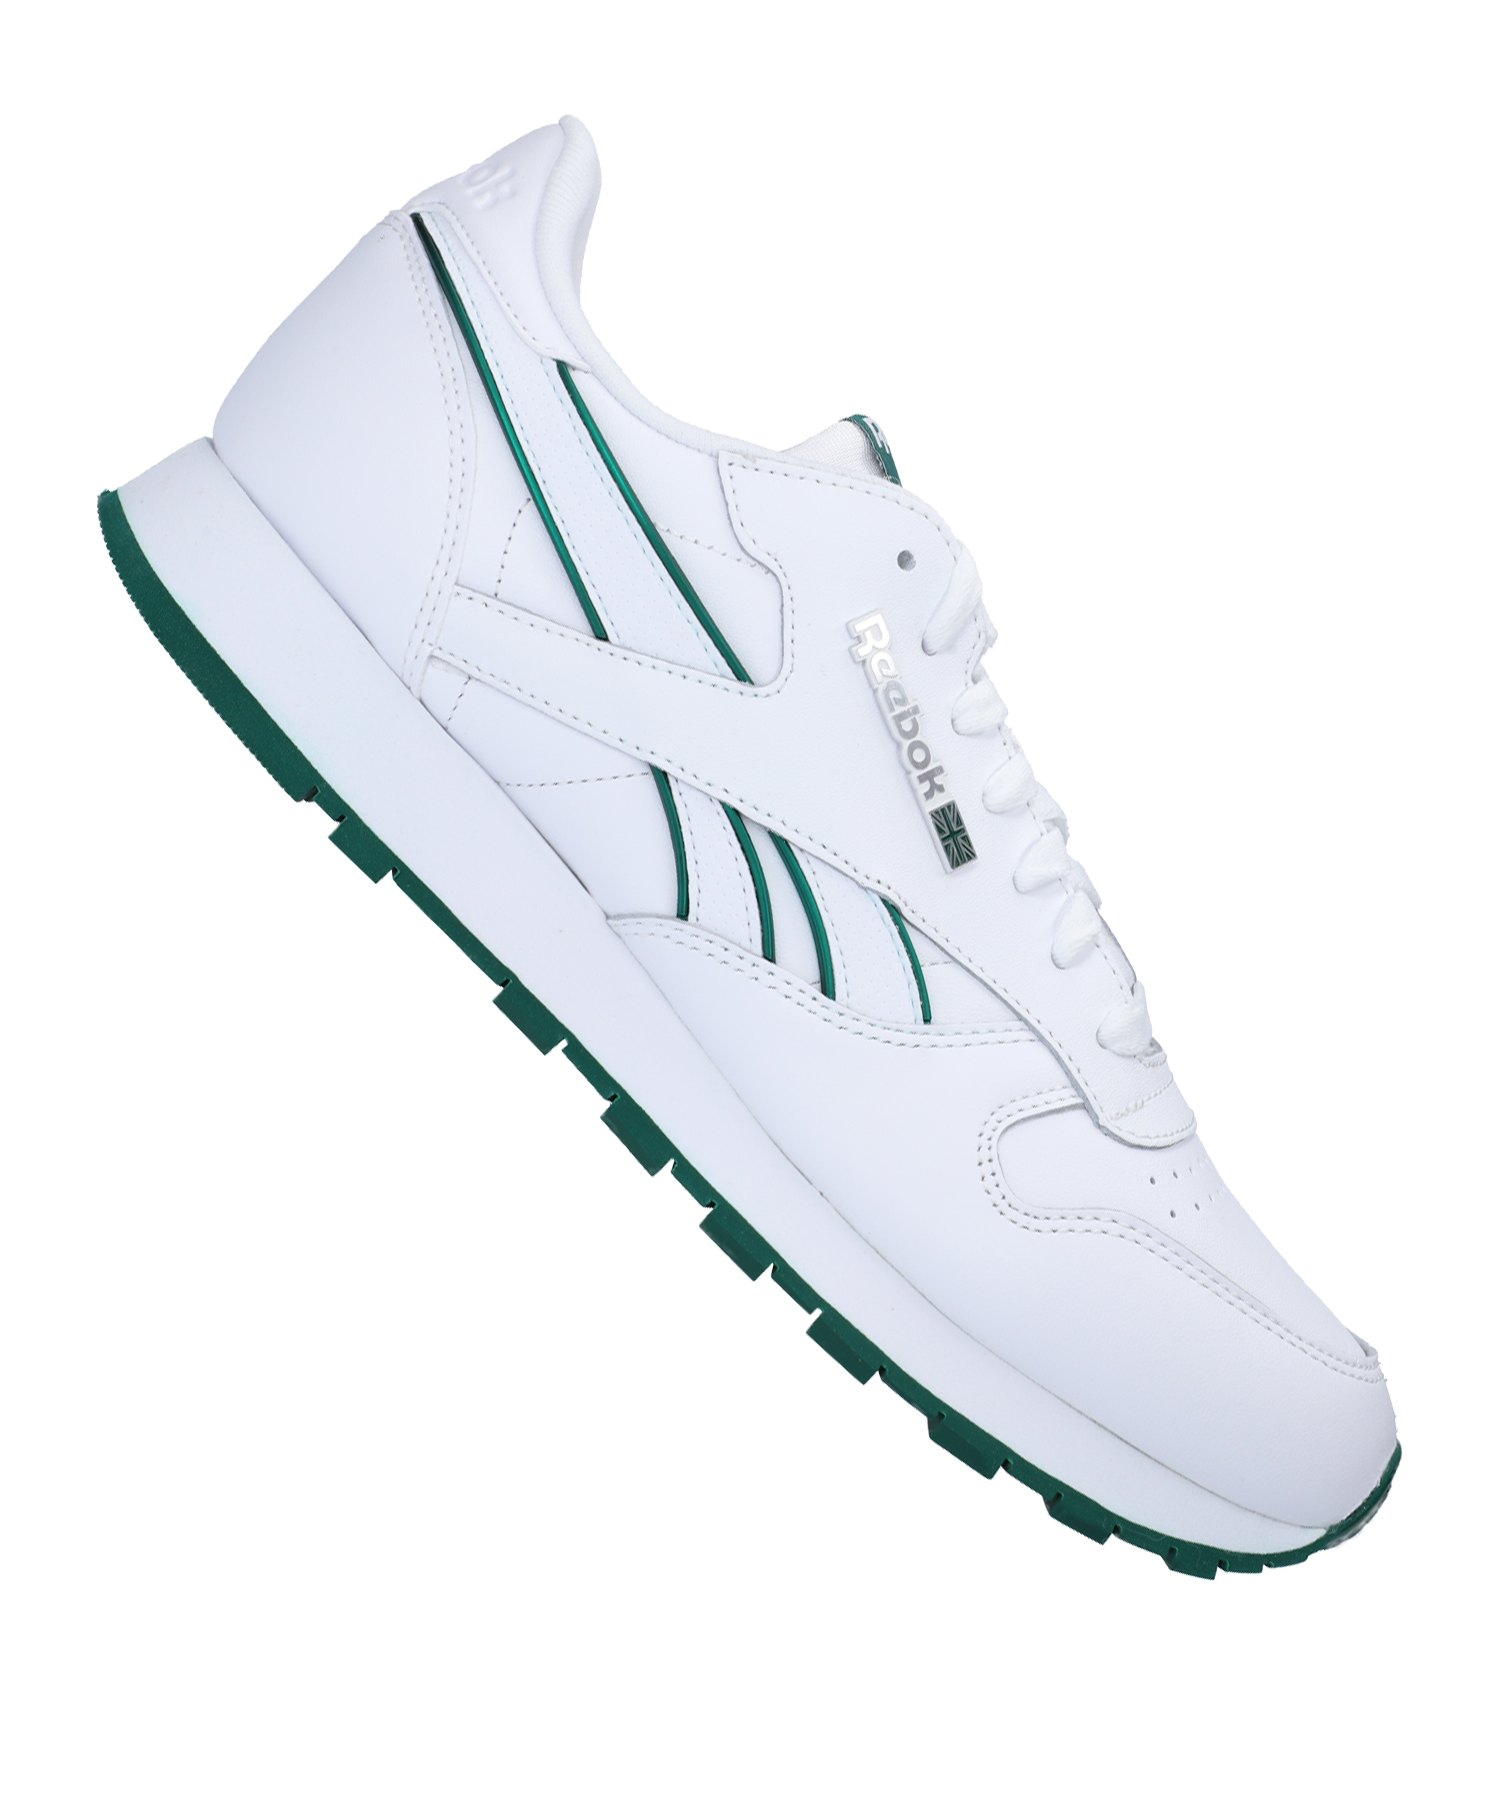 Weiss Reebok Leather Classic Sneaker MU l53JuFK1cT